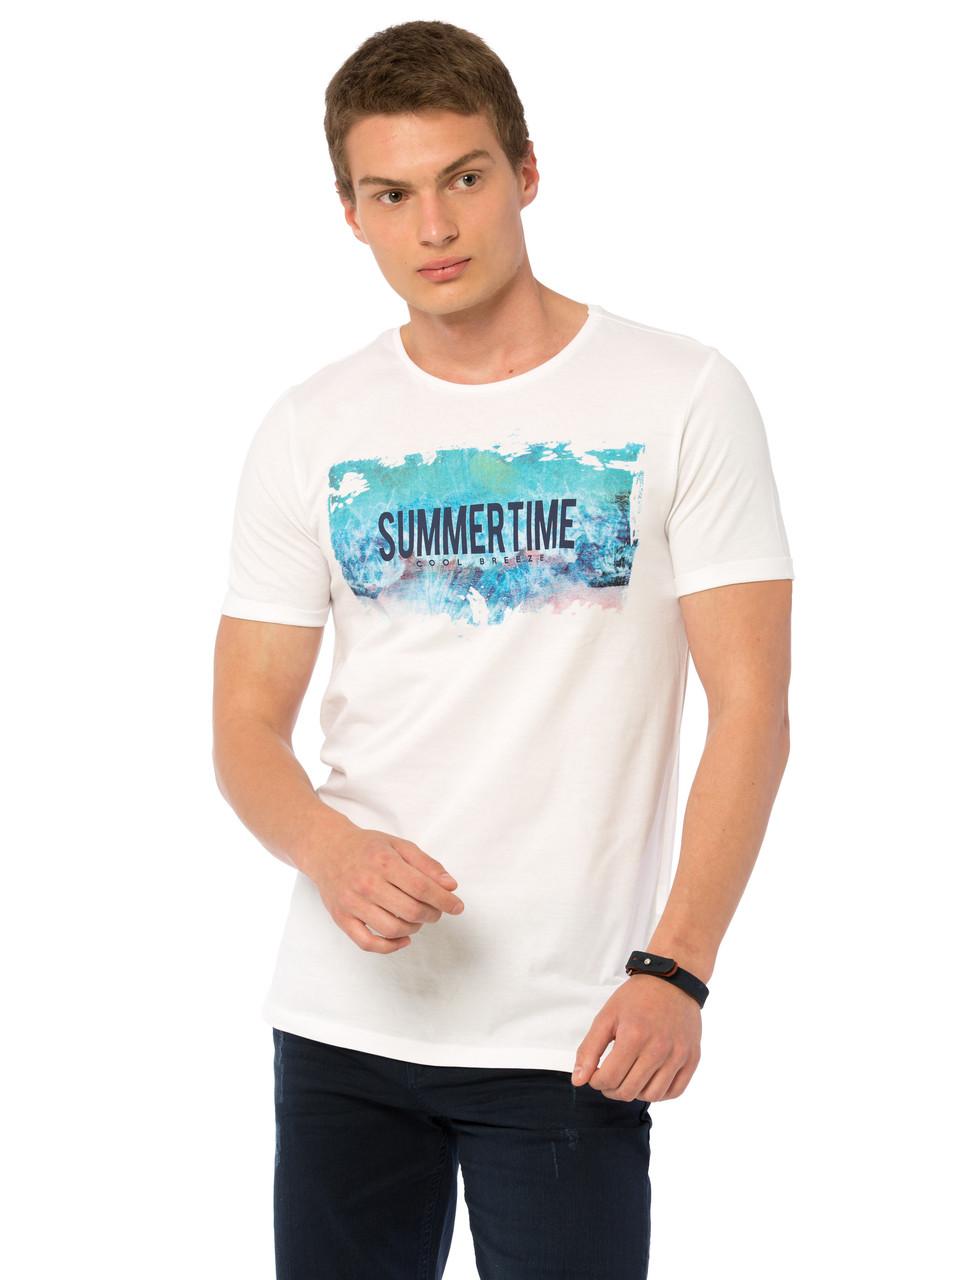 Белая мужская футболка Lc Waikiki / Лс Вайкики с надписью Summertime